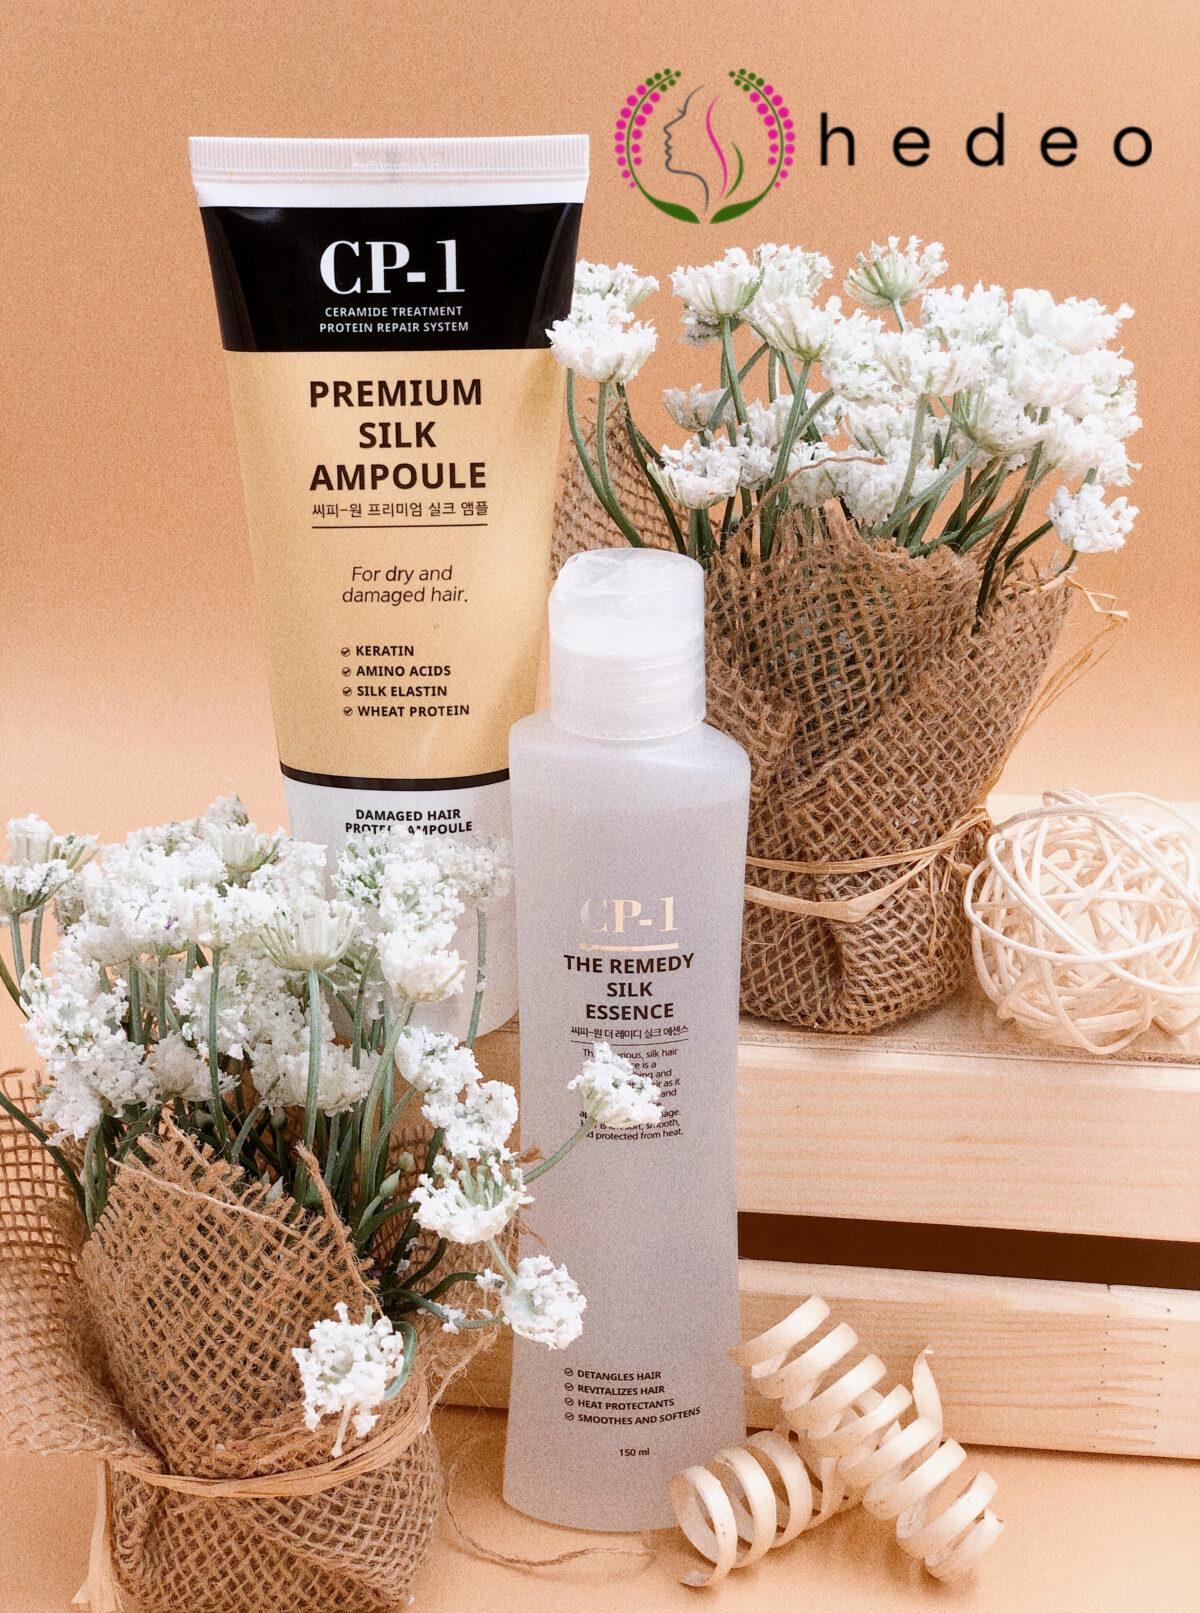 cp-1-premium-silk-ampoule-logo